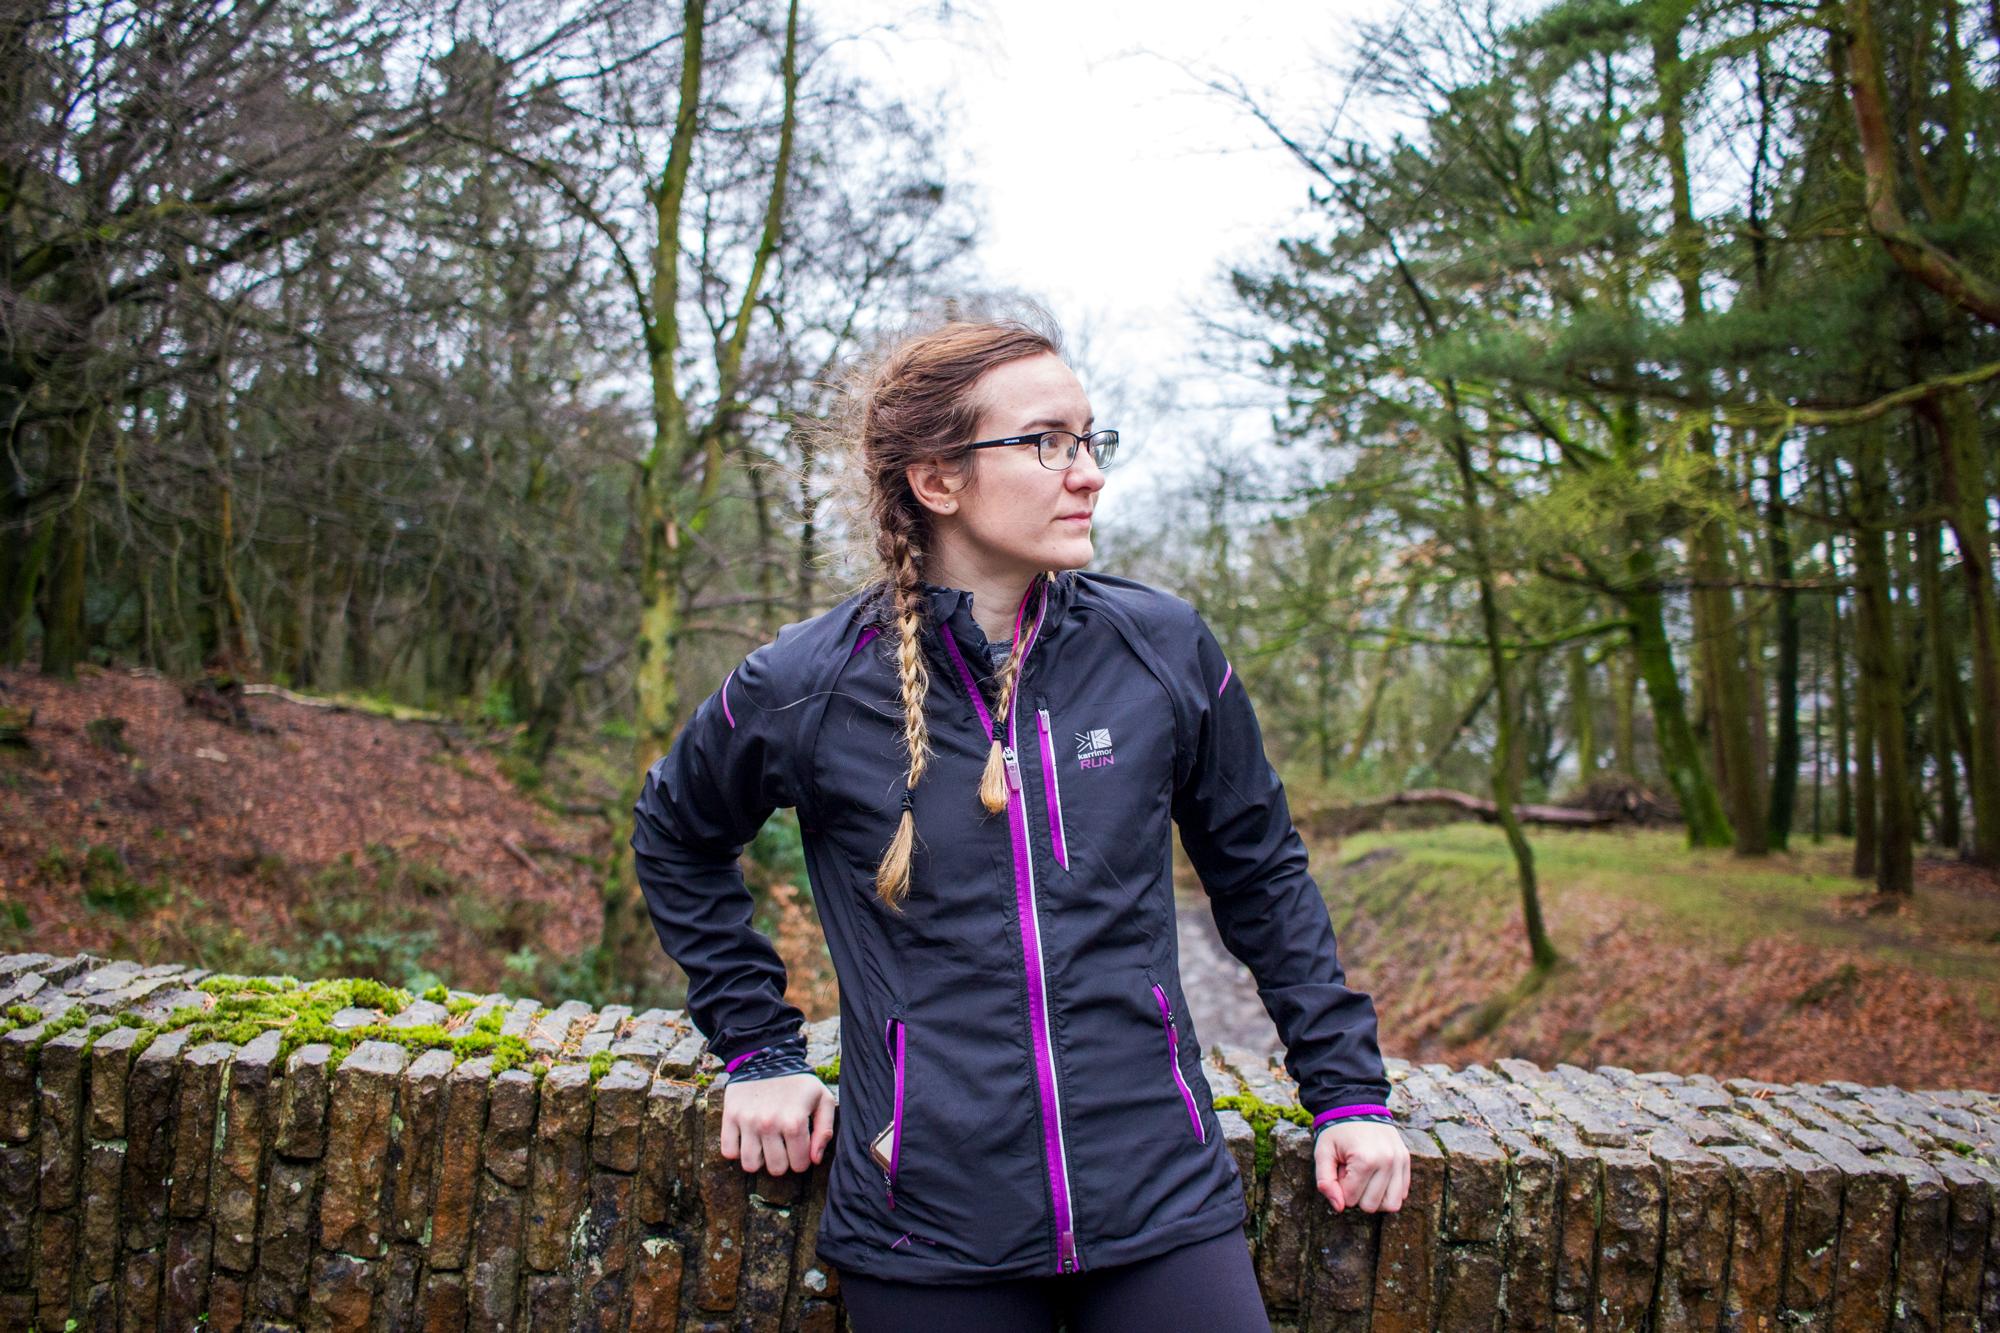 How To Keep Running When The Weather Sucks | Girl in Rain Jacket | awaywithkatie.com